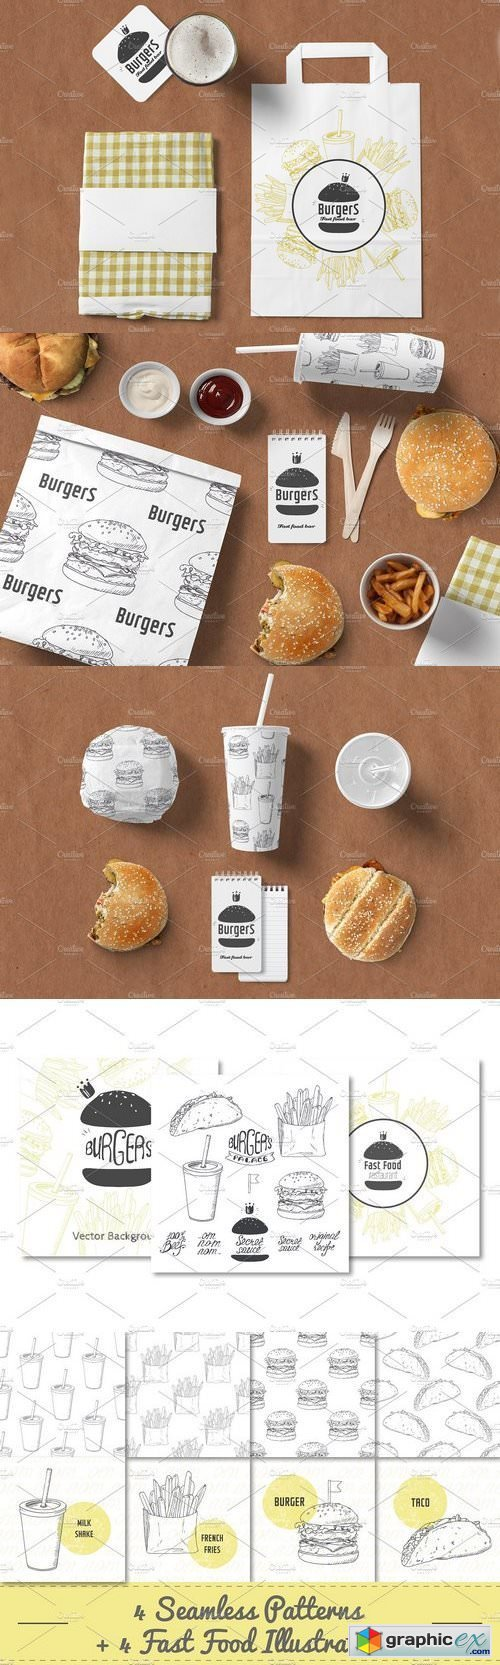 Fast food bundle